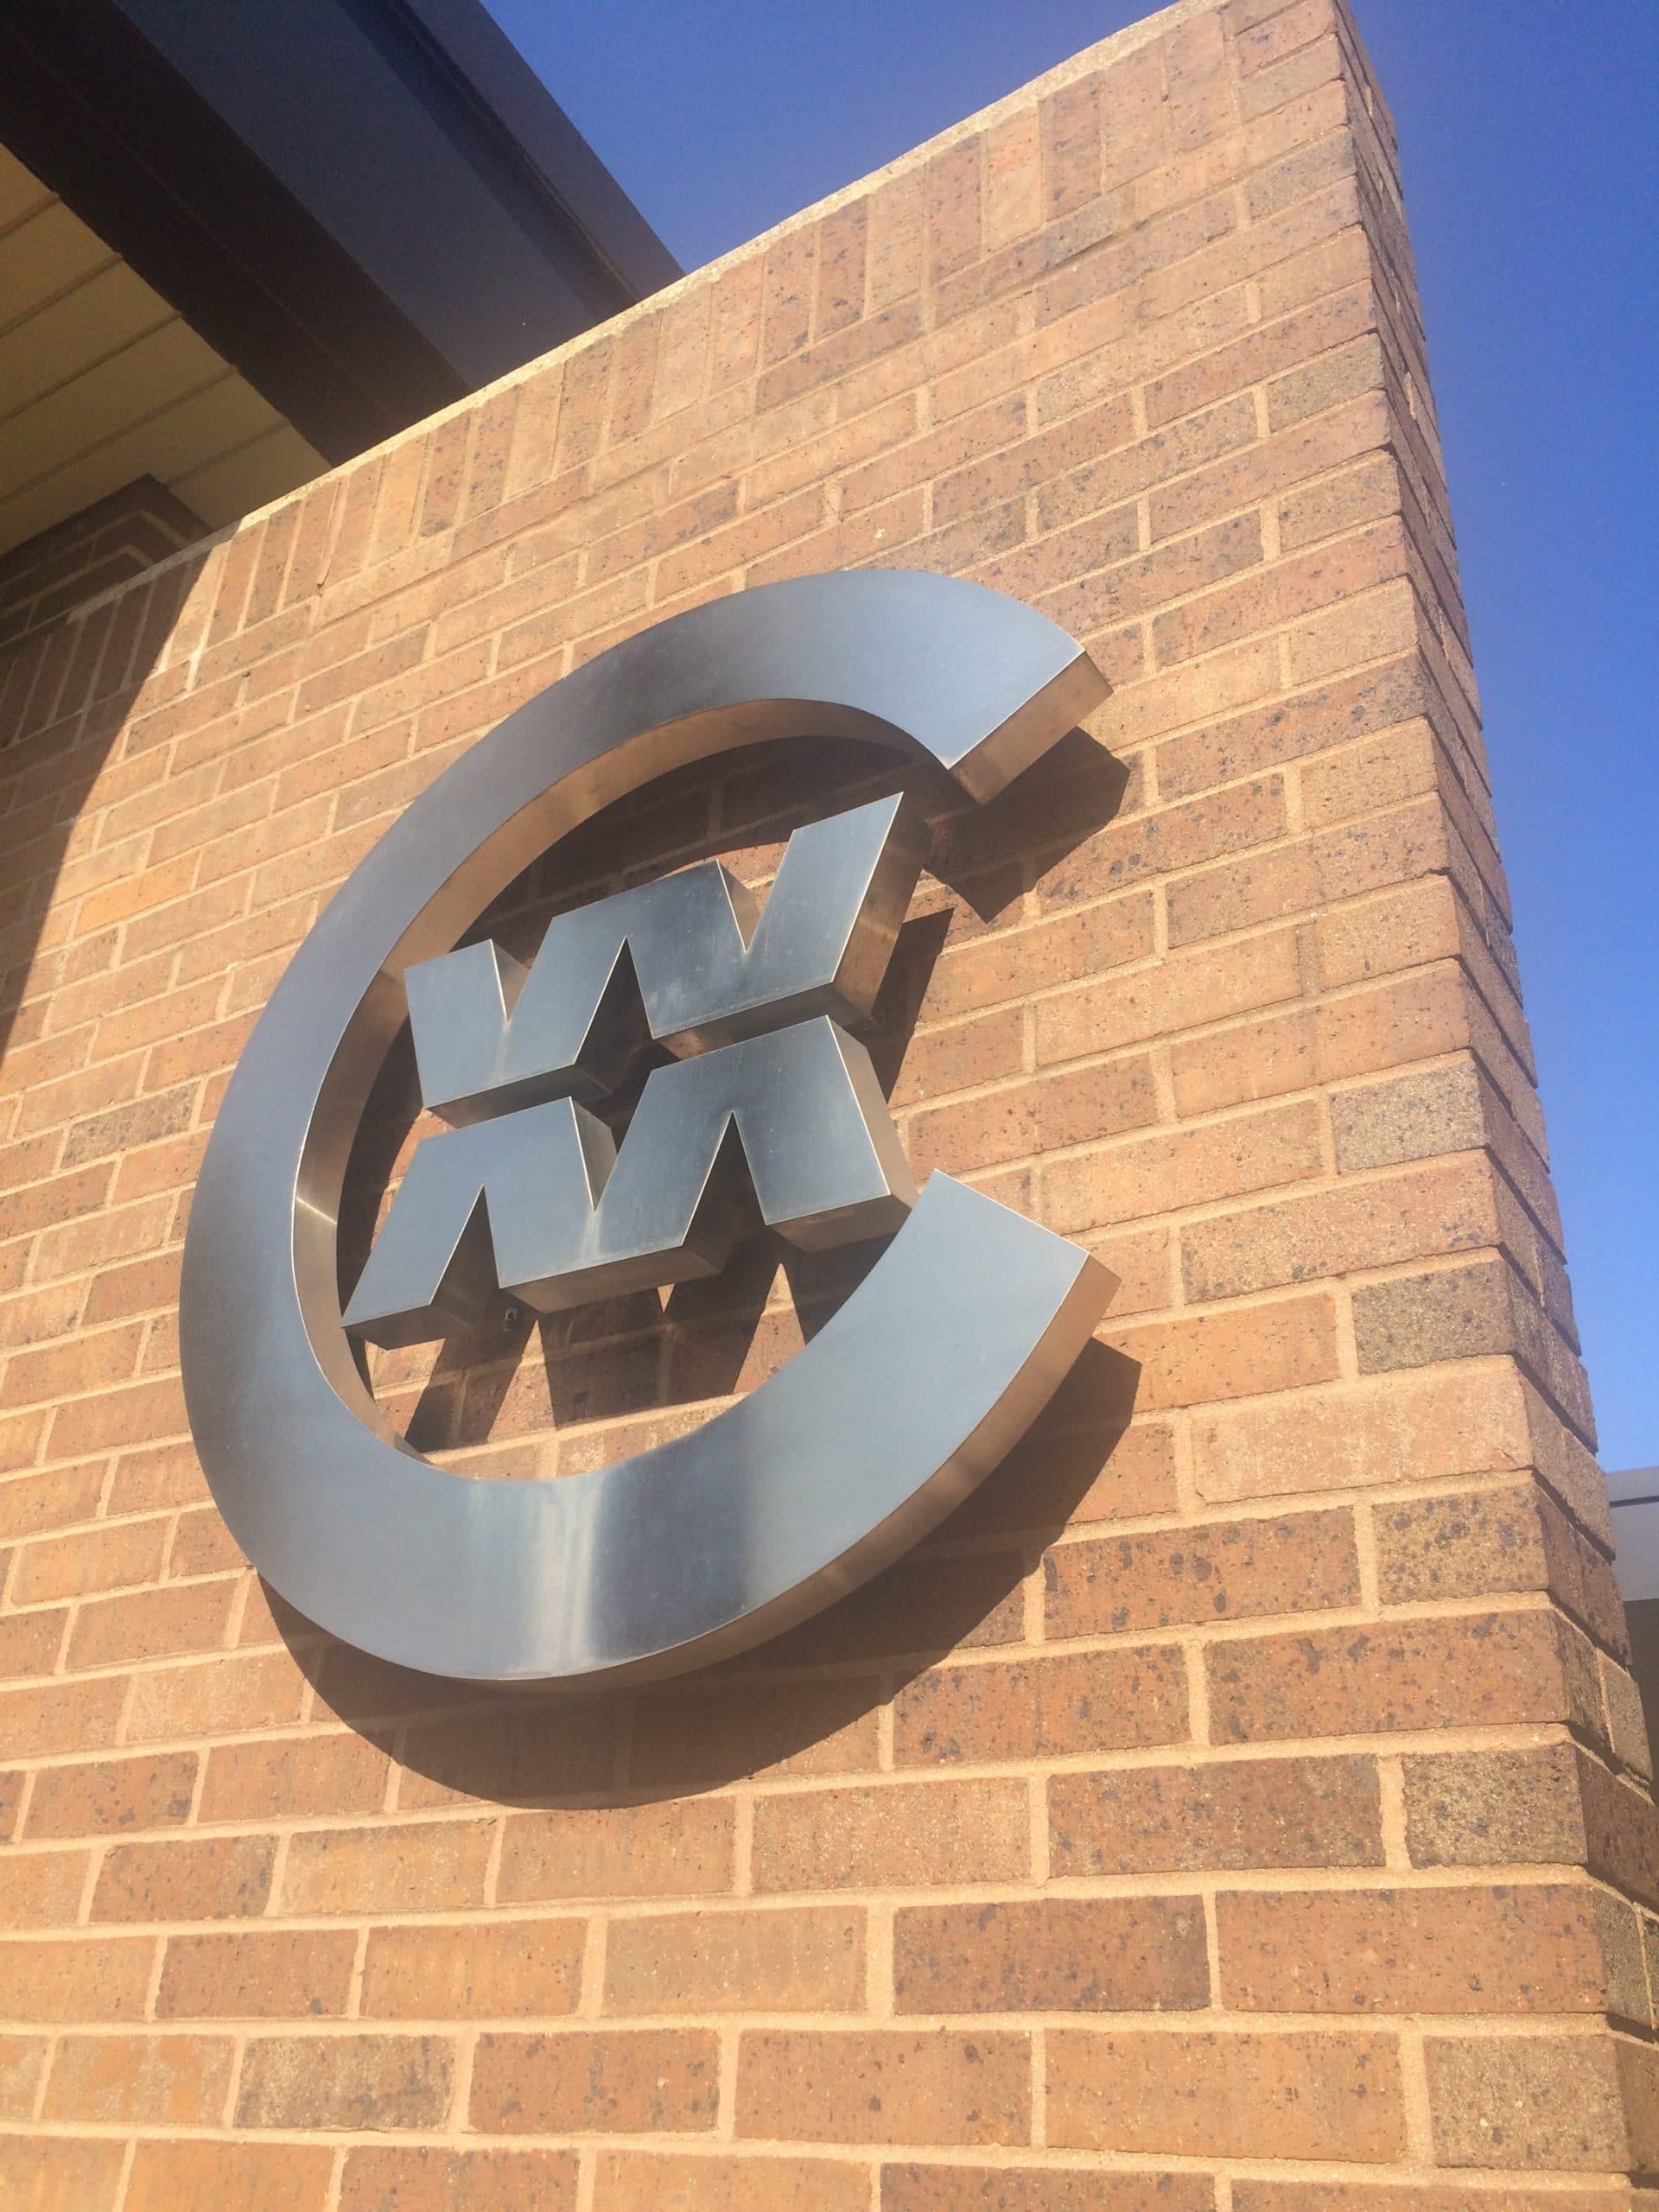 CWM building logo